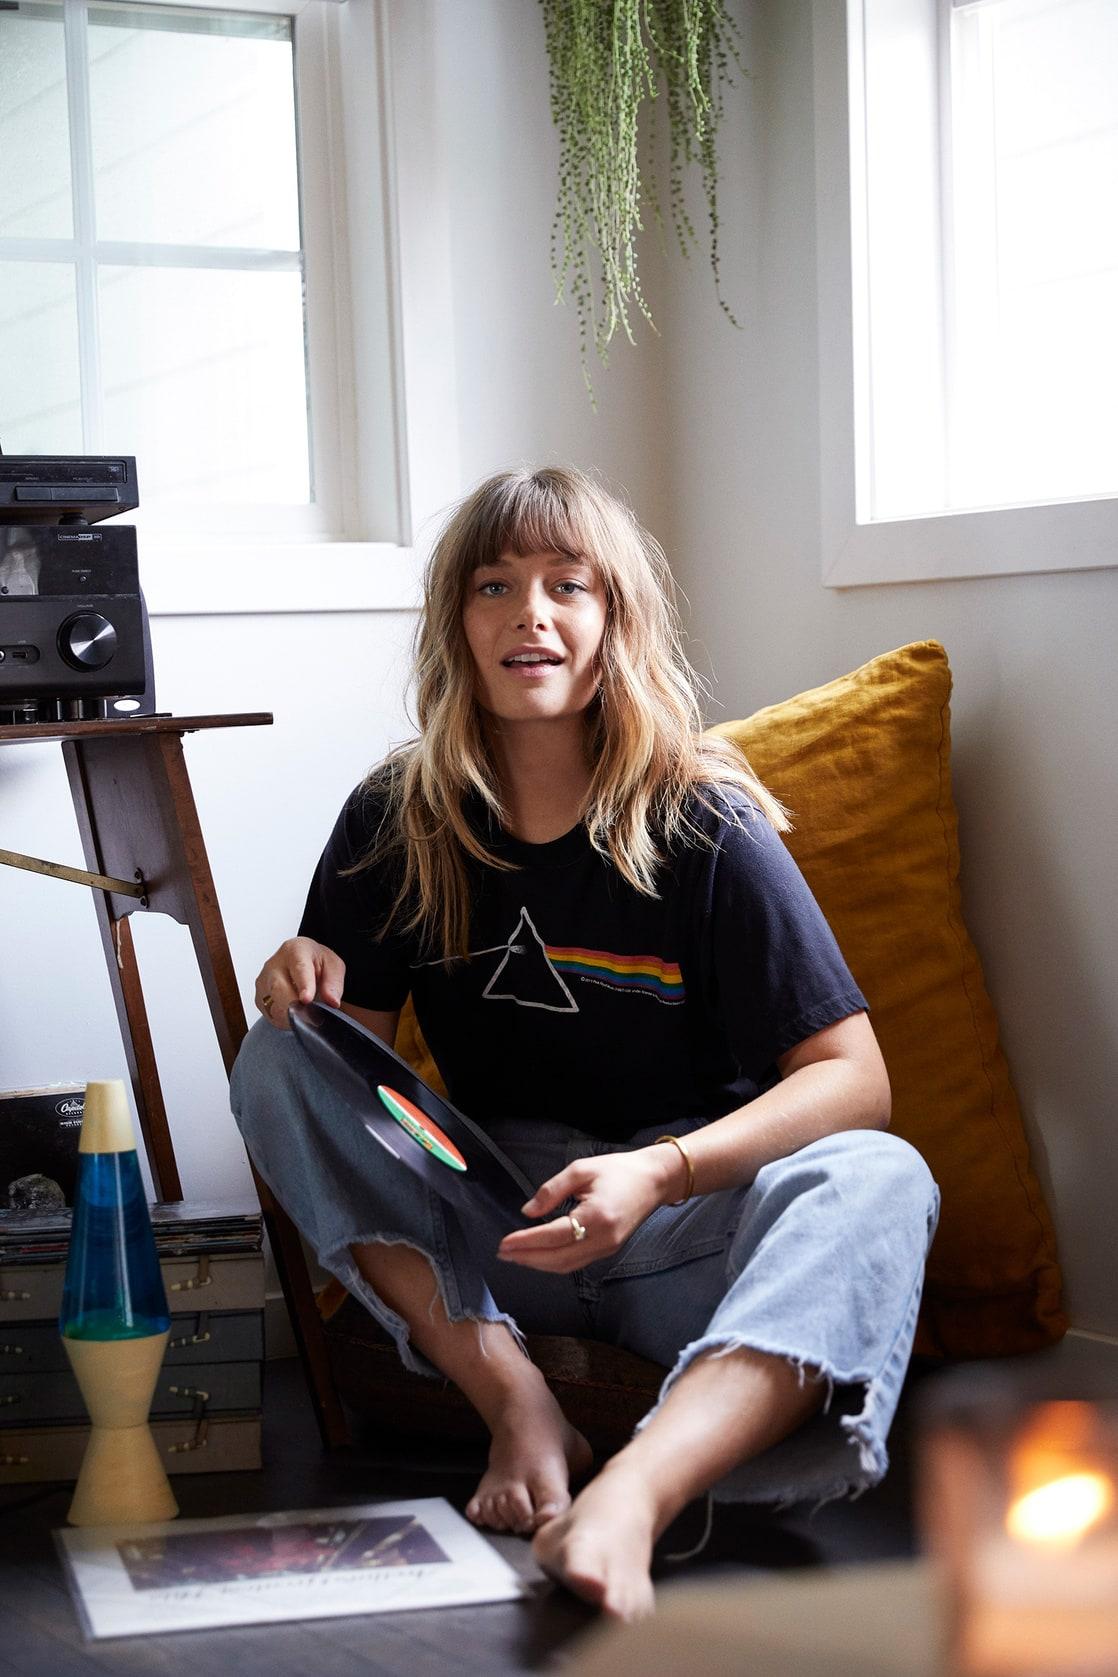 Pics Rachel Keller nudes (38 photo), Tits, Bikini, Instagram, butt 2018